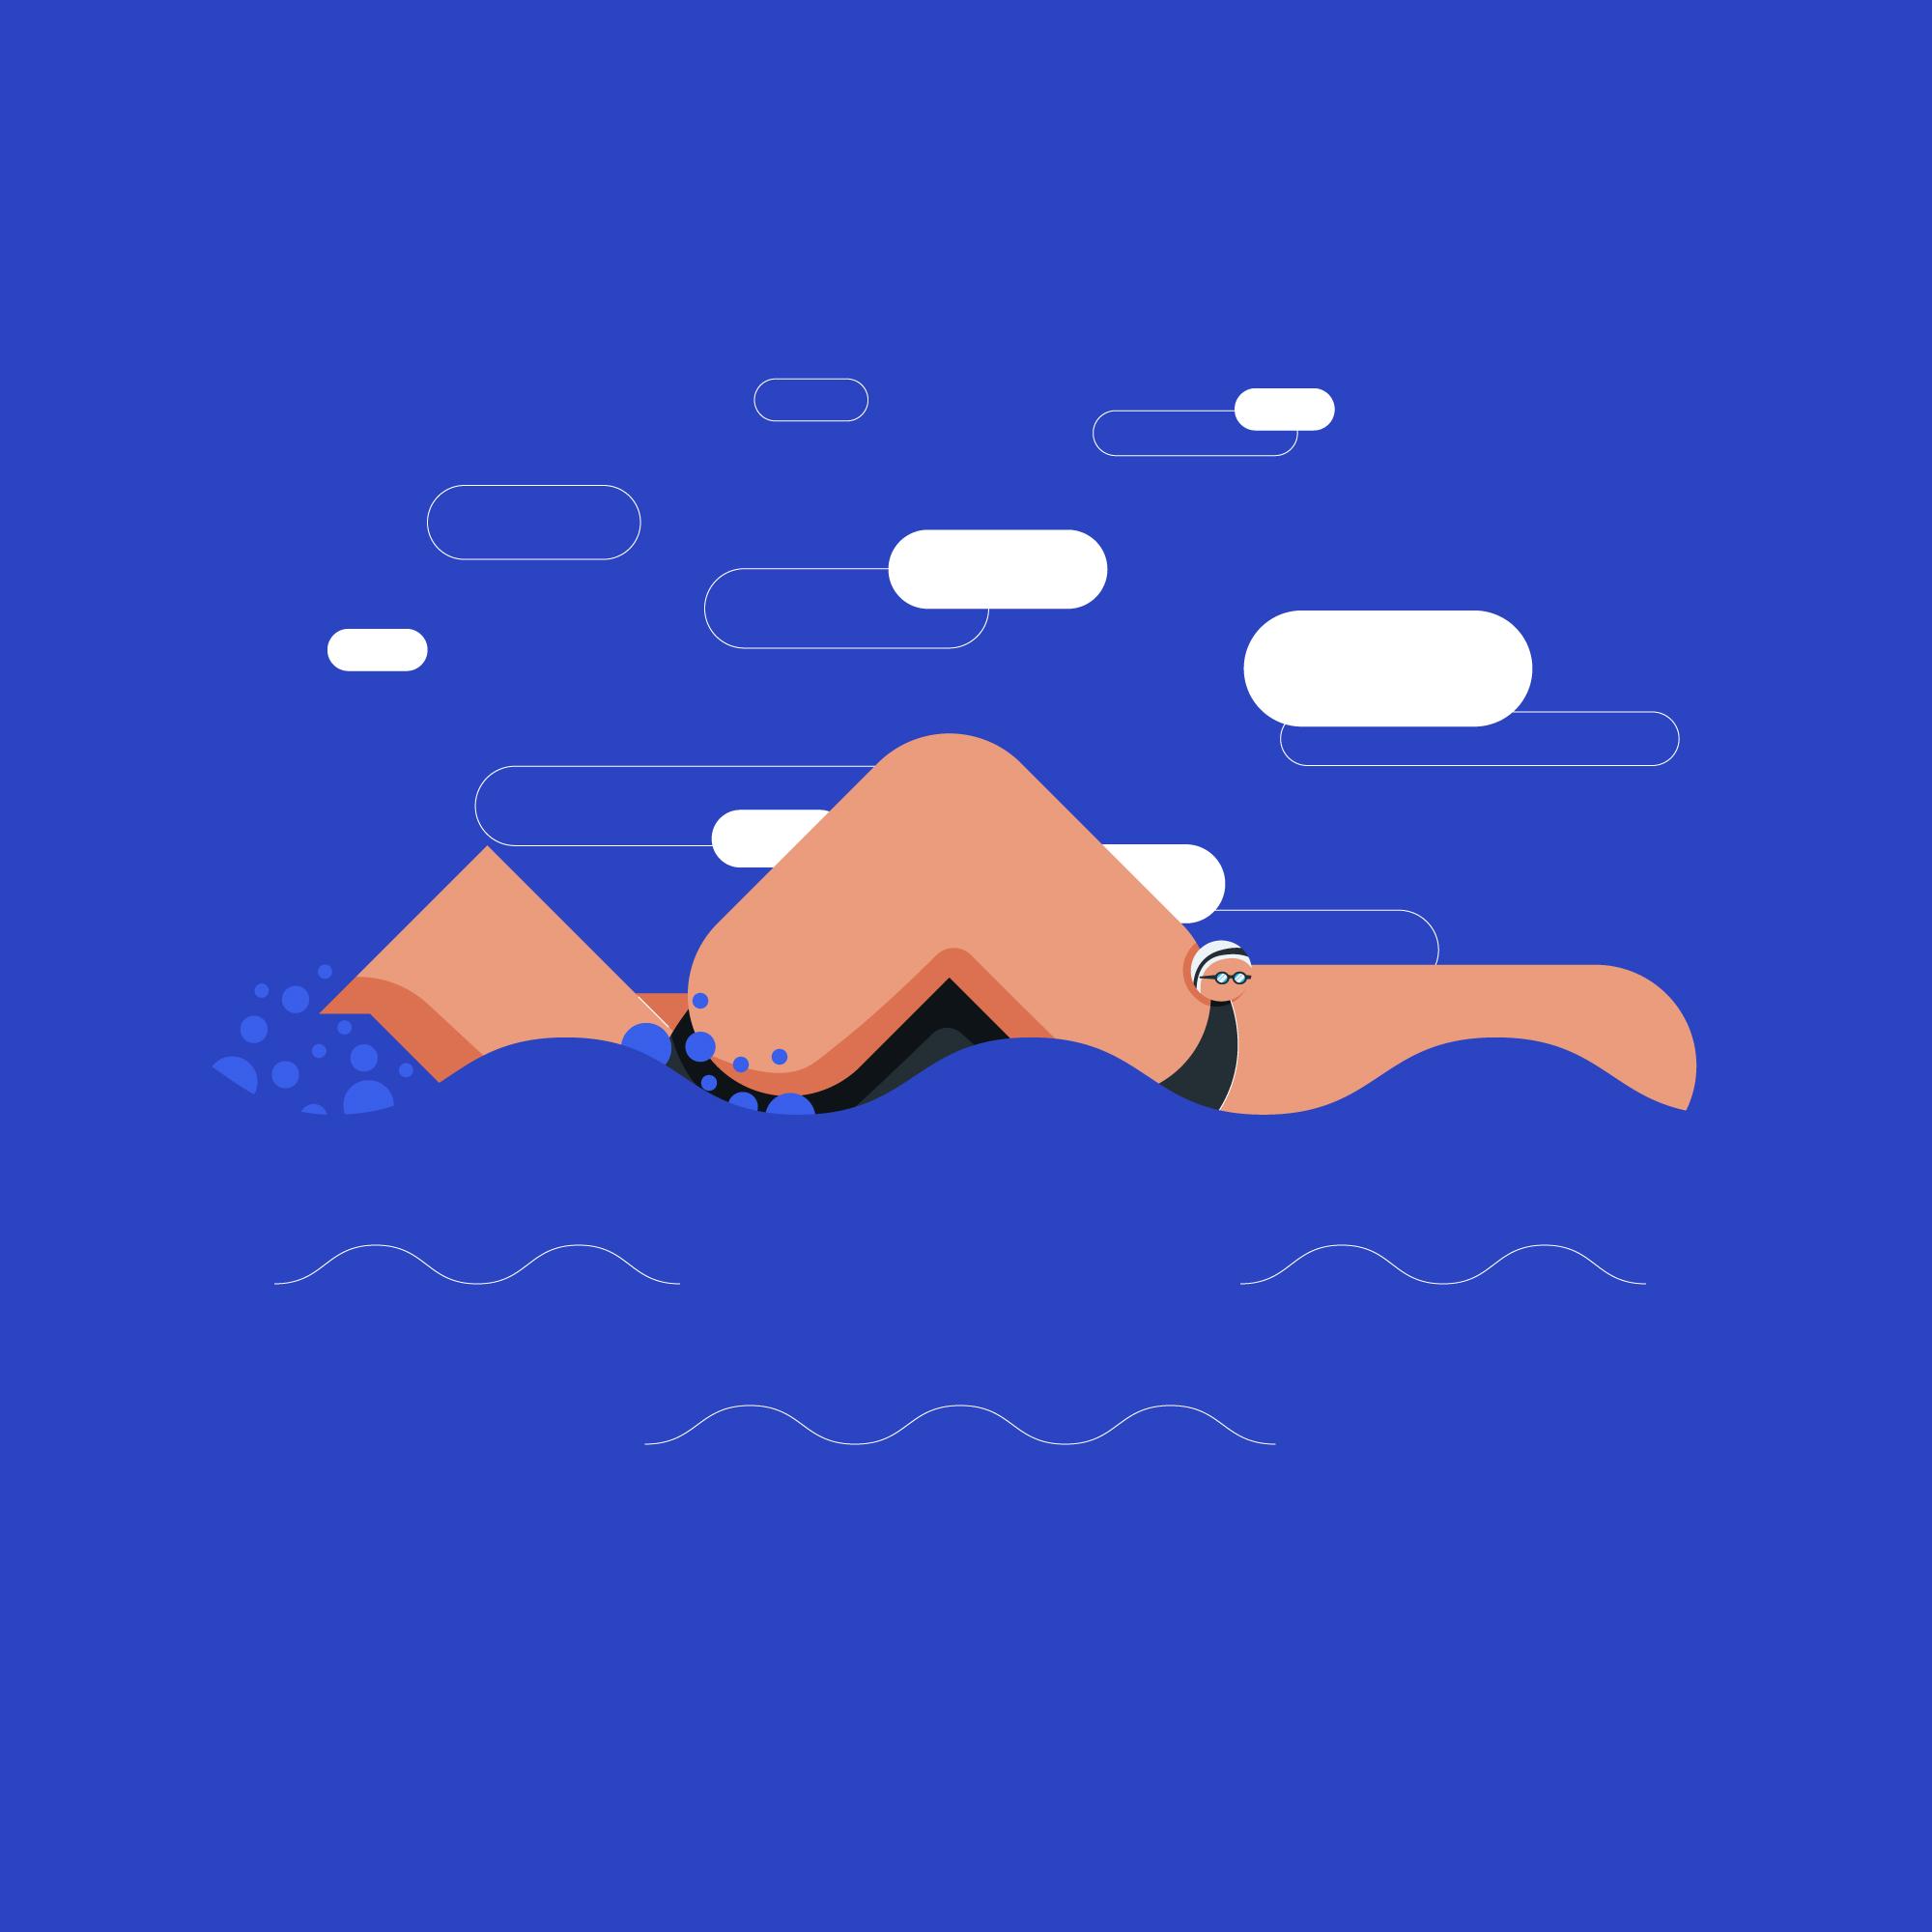 BigBuds_Swimming_Insta.jpg